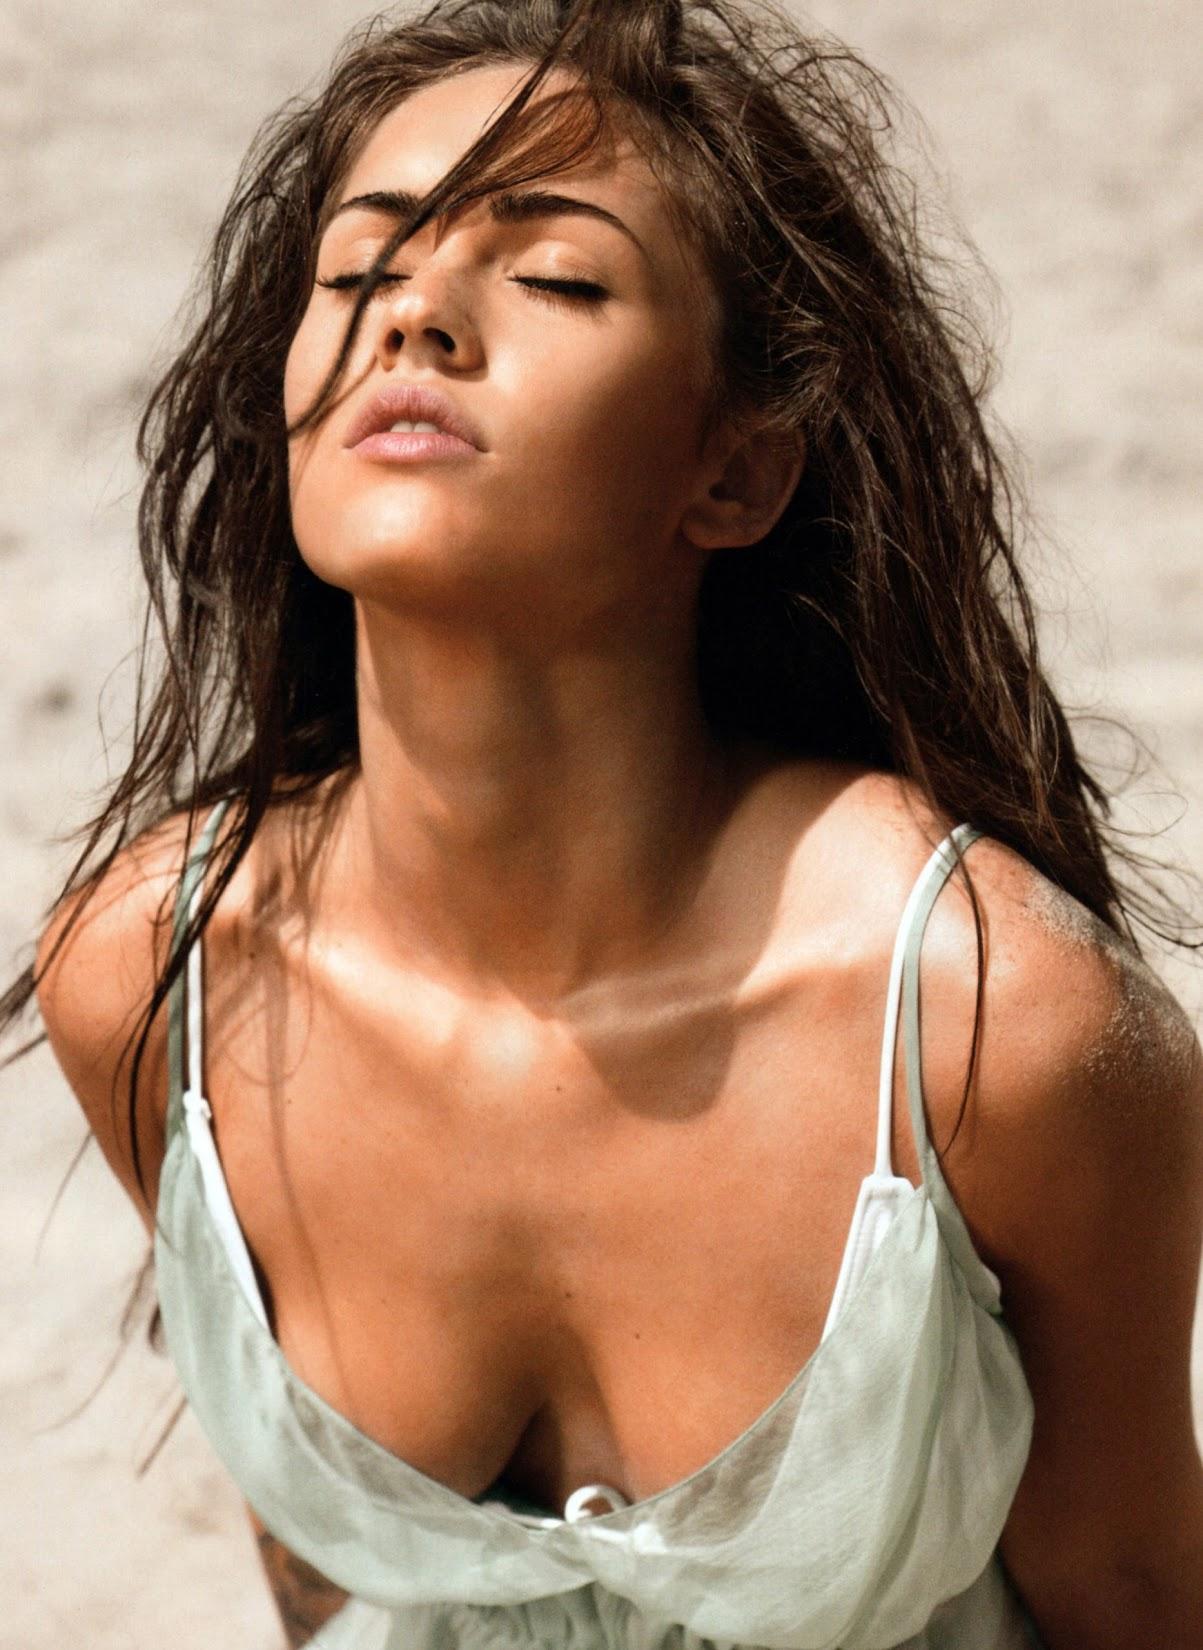 http://4.bp.blogspot.com/-p8wntA0S9cQ/T1V98W_sXfI/AAAAAAAABUs/a_OUBKRbY7A/s1650/Megan-Fox-2008-Esquire-2.jpg